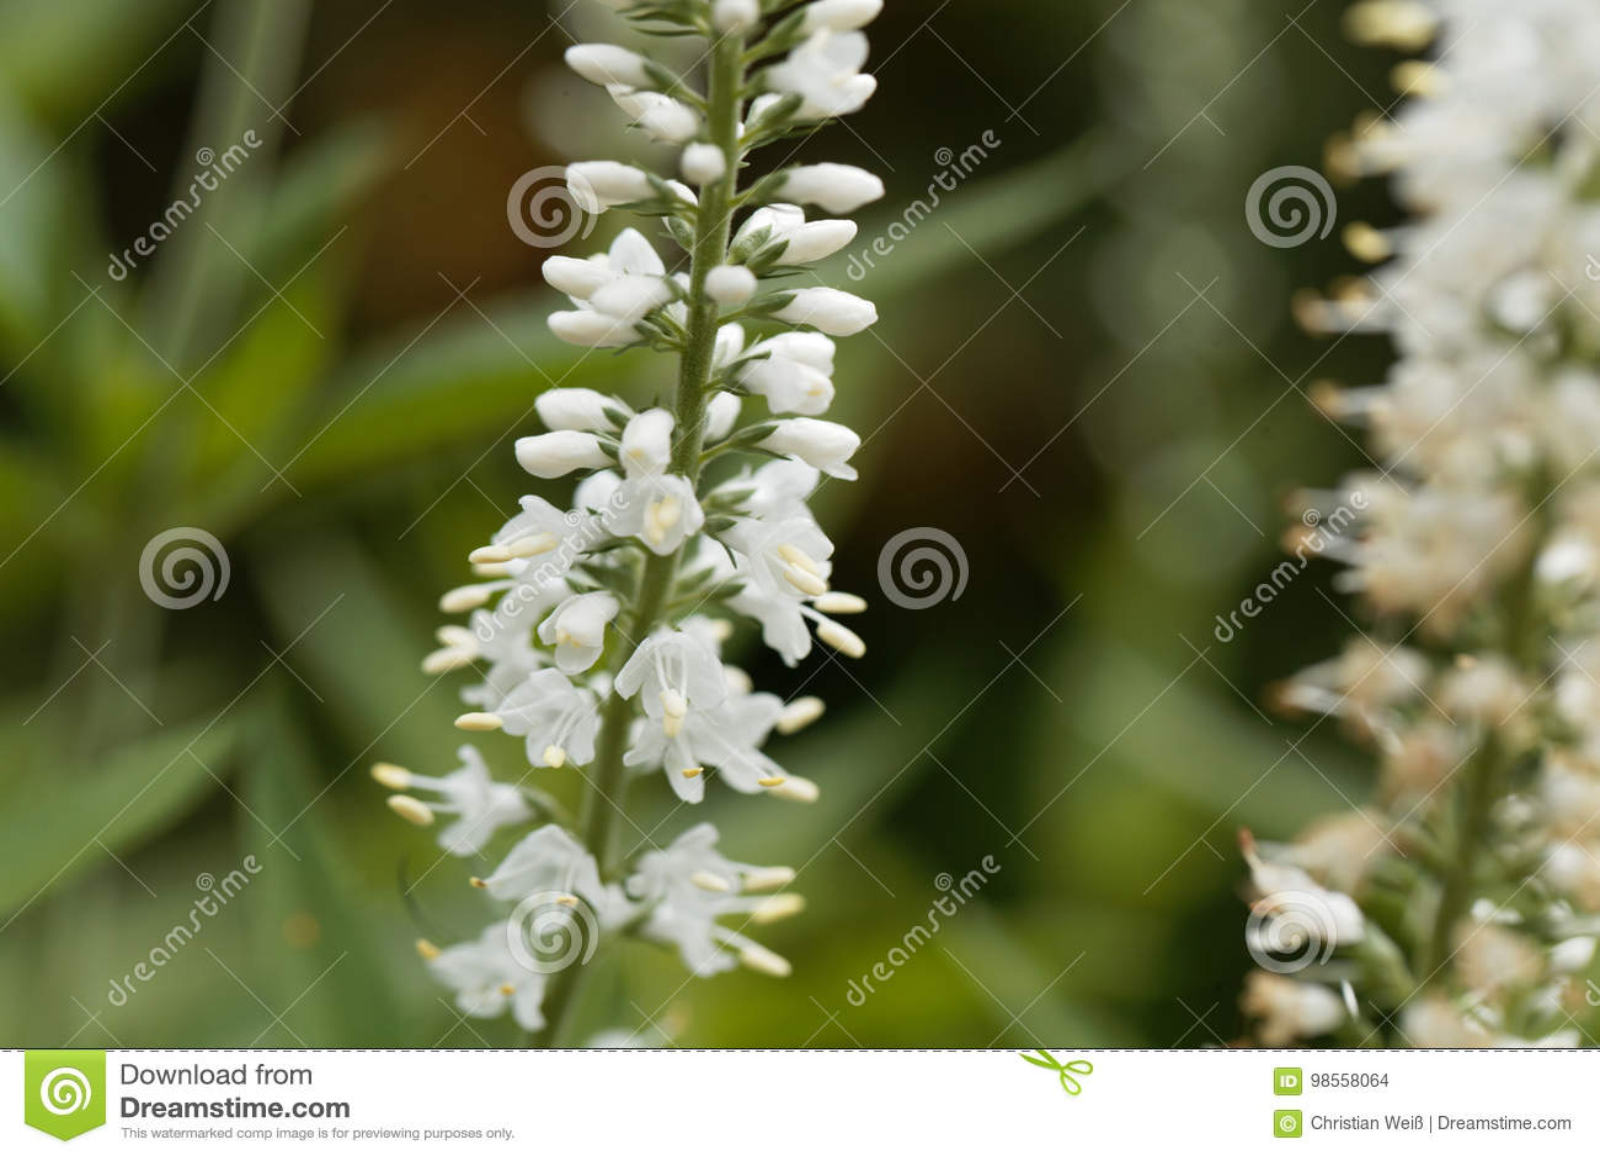 White garden speedwell flowers veronica longifolia stock photo download white garden speedwell flowers veronica longifolia stock photo image of macro close mightylinksfo